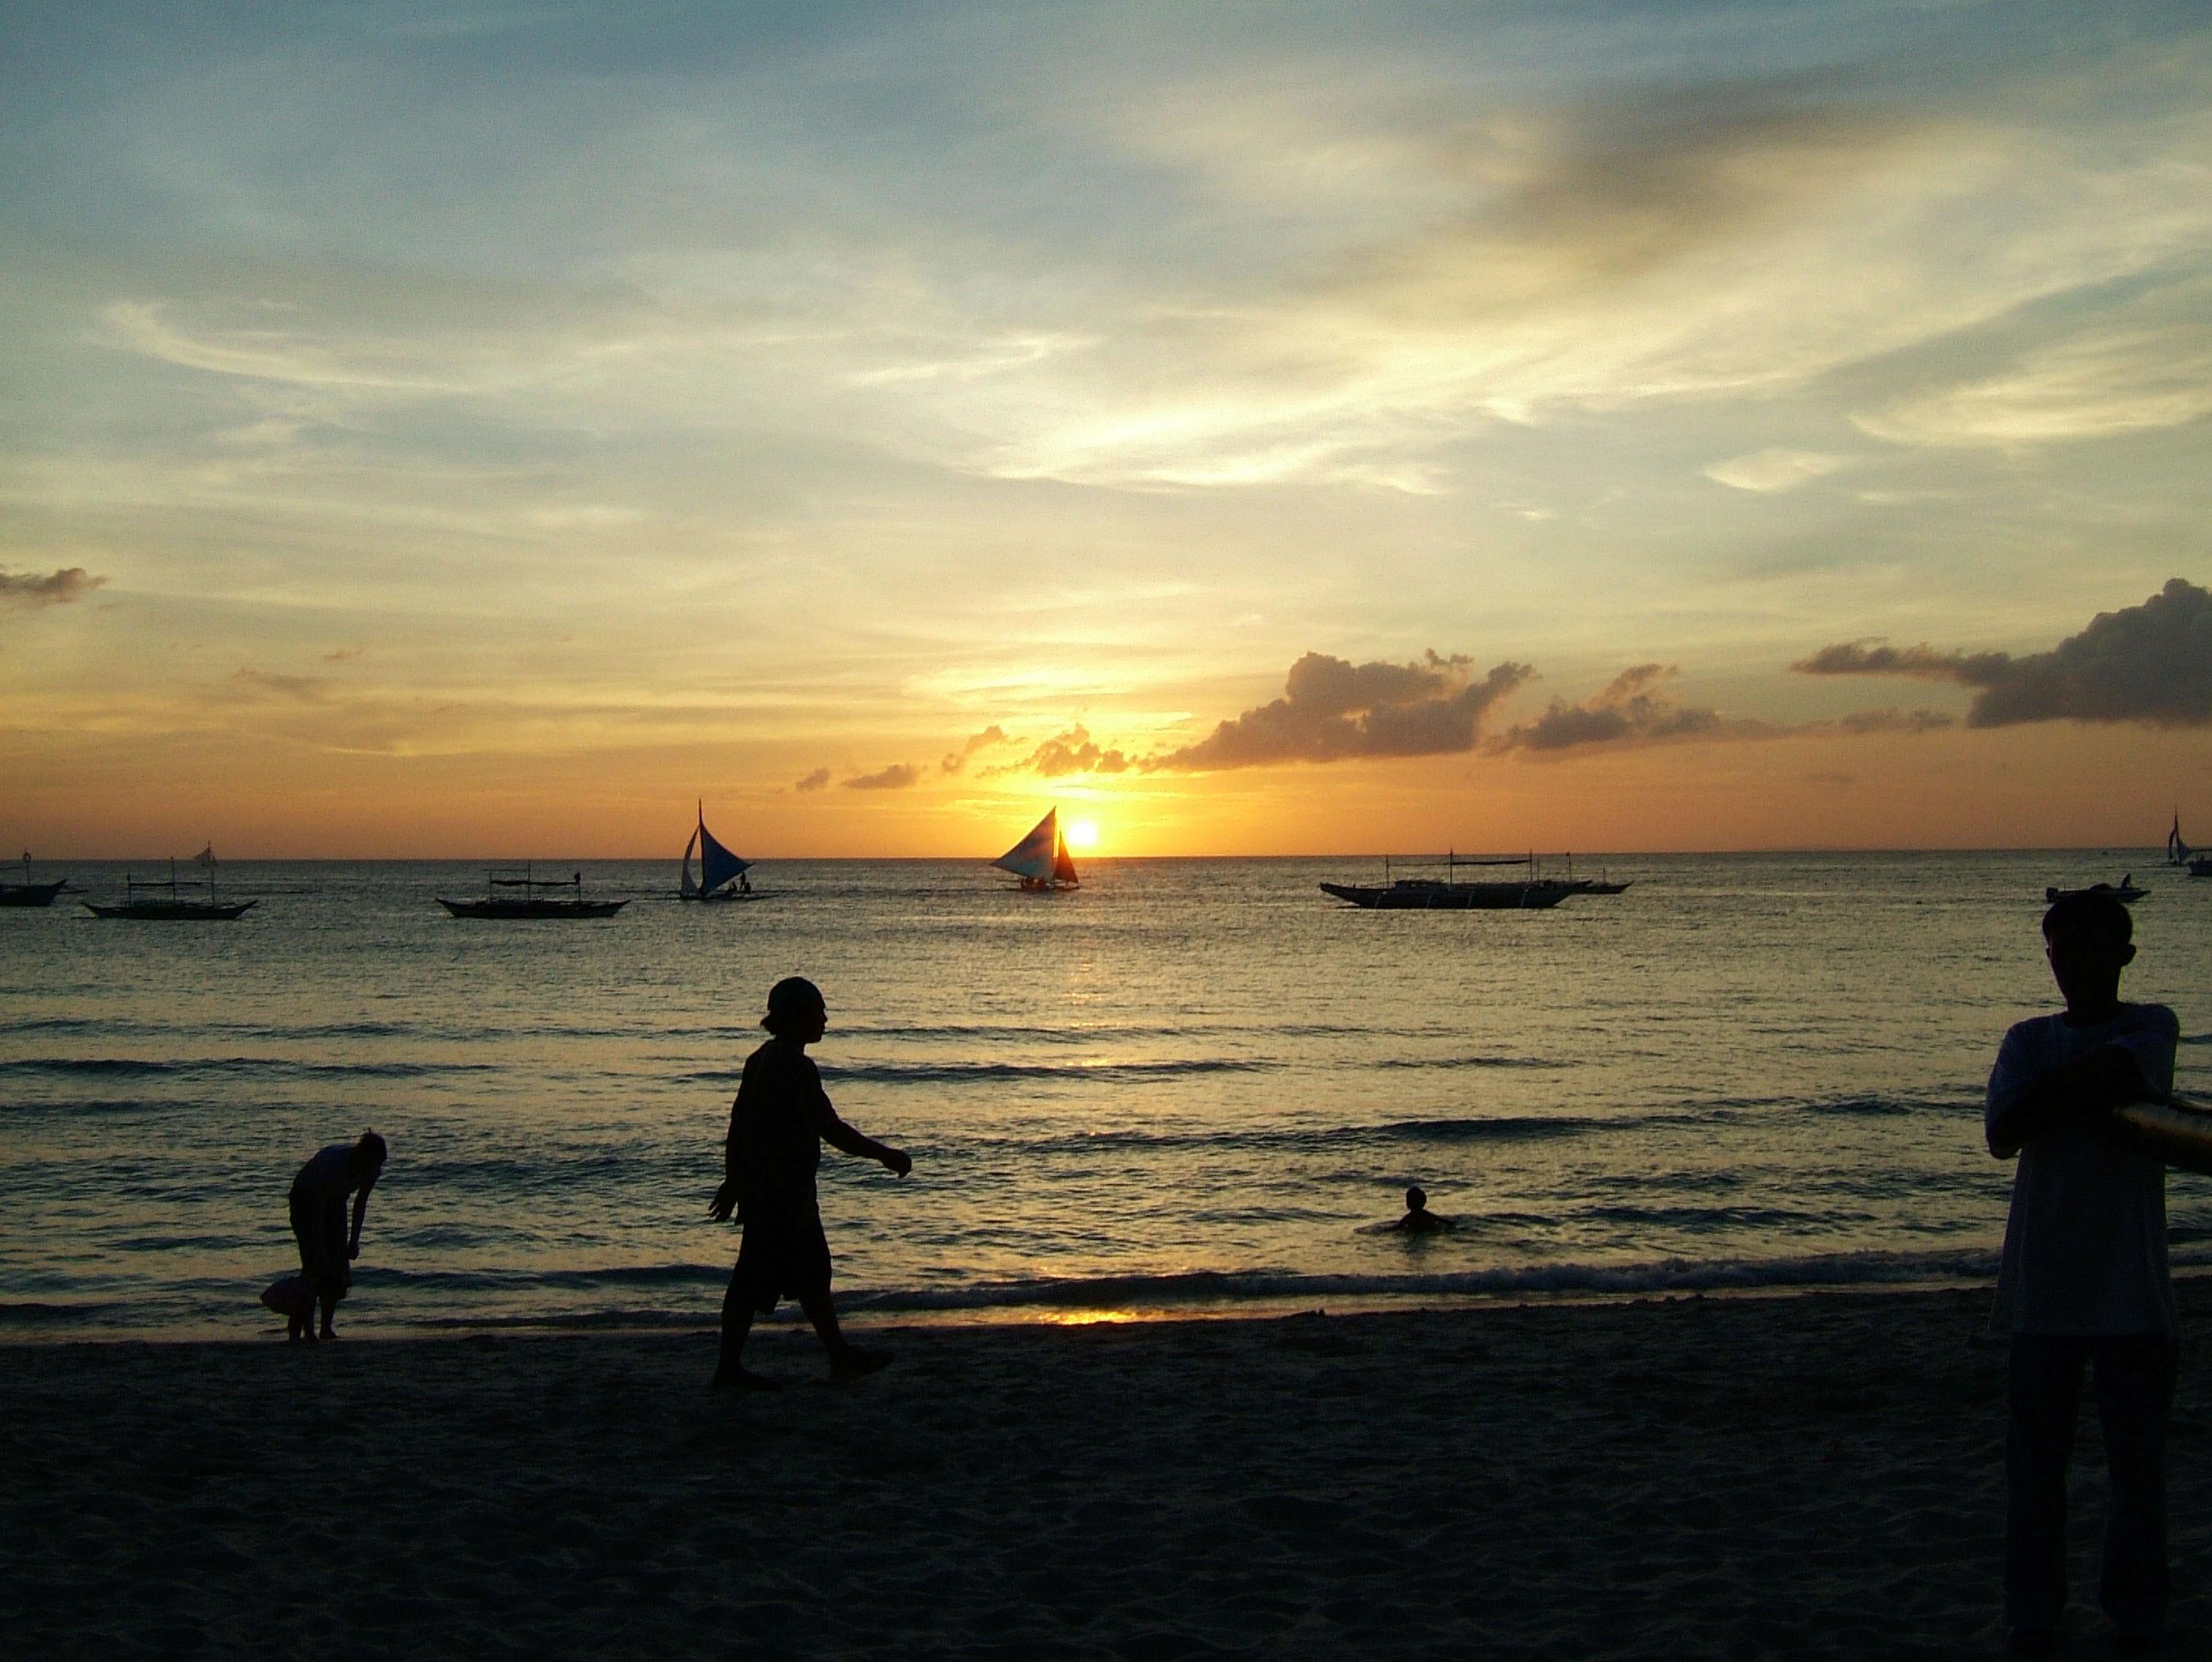 Philippines Panay Negros Caticlan Boracay White Beach Sunset Dec 2003 01